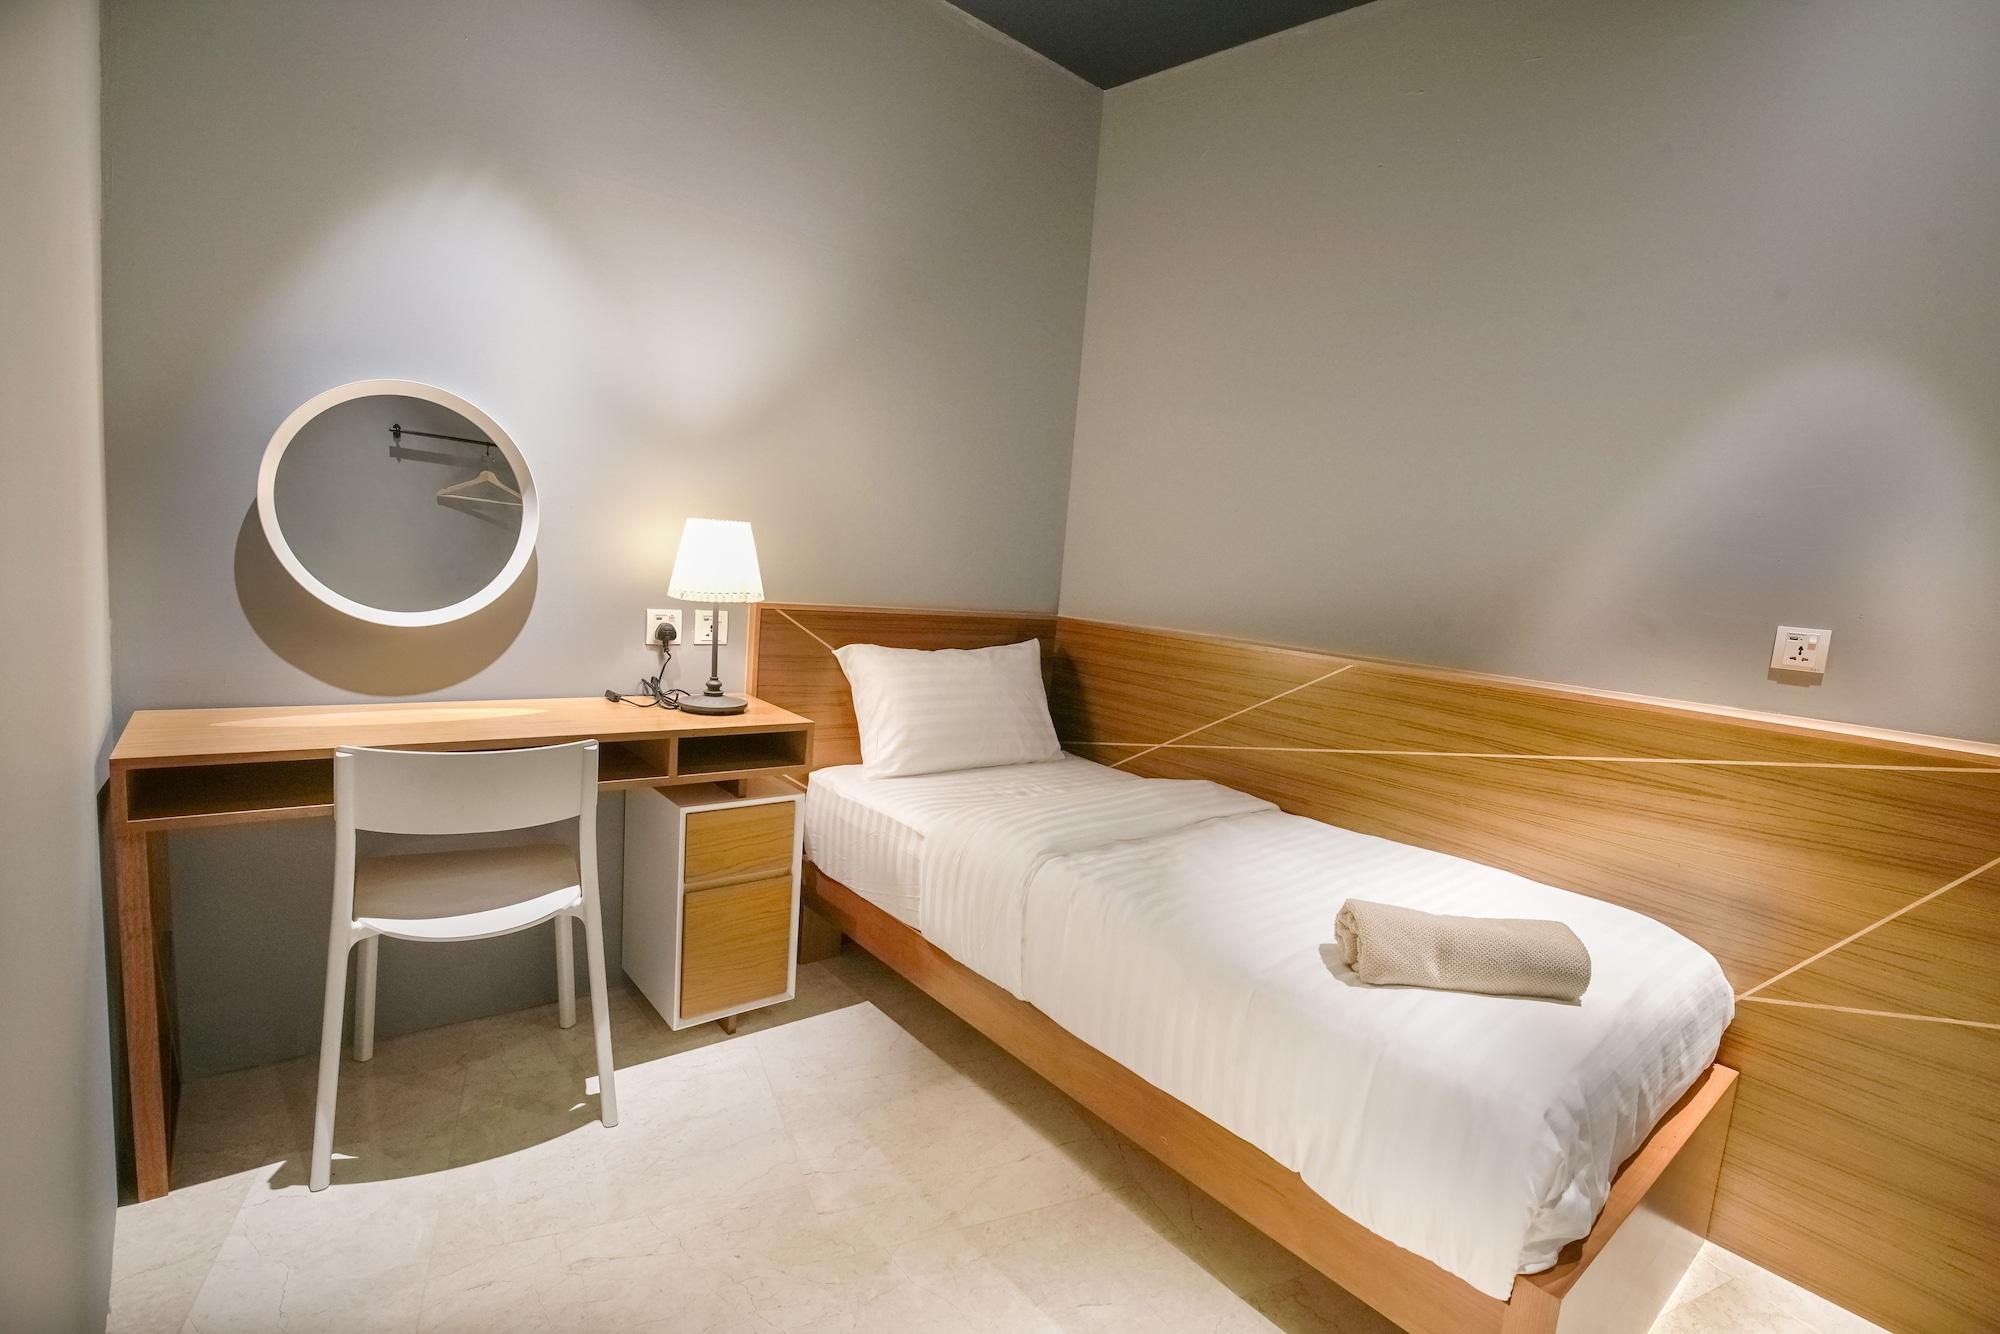 The Bed KLCC - Hostel, Kuala Lumpur